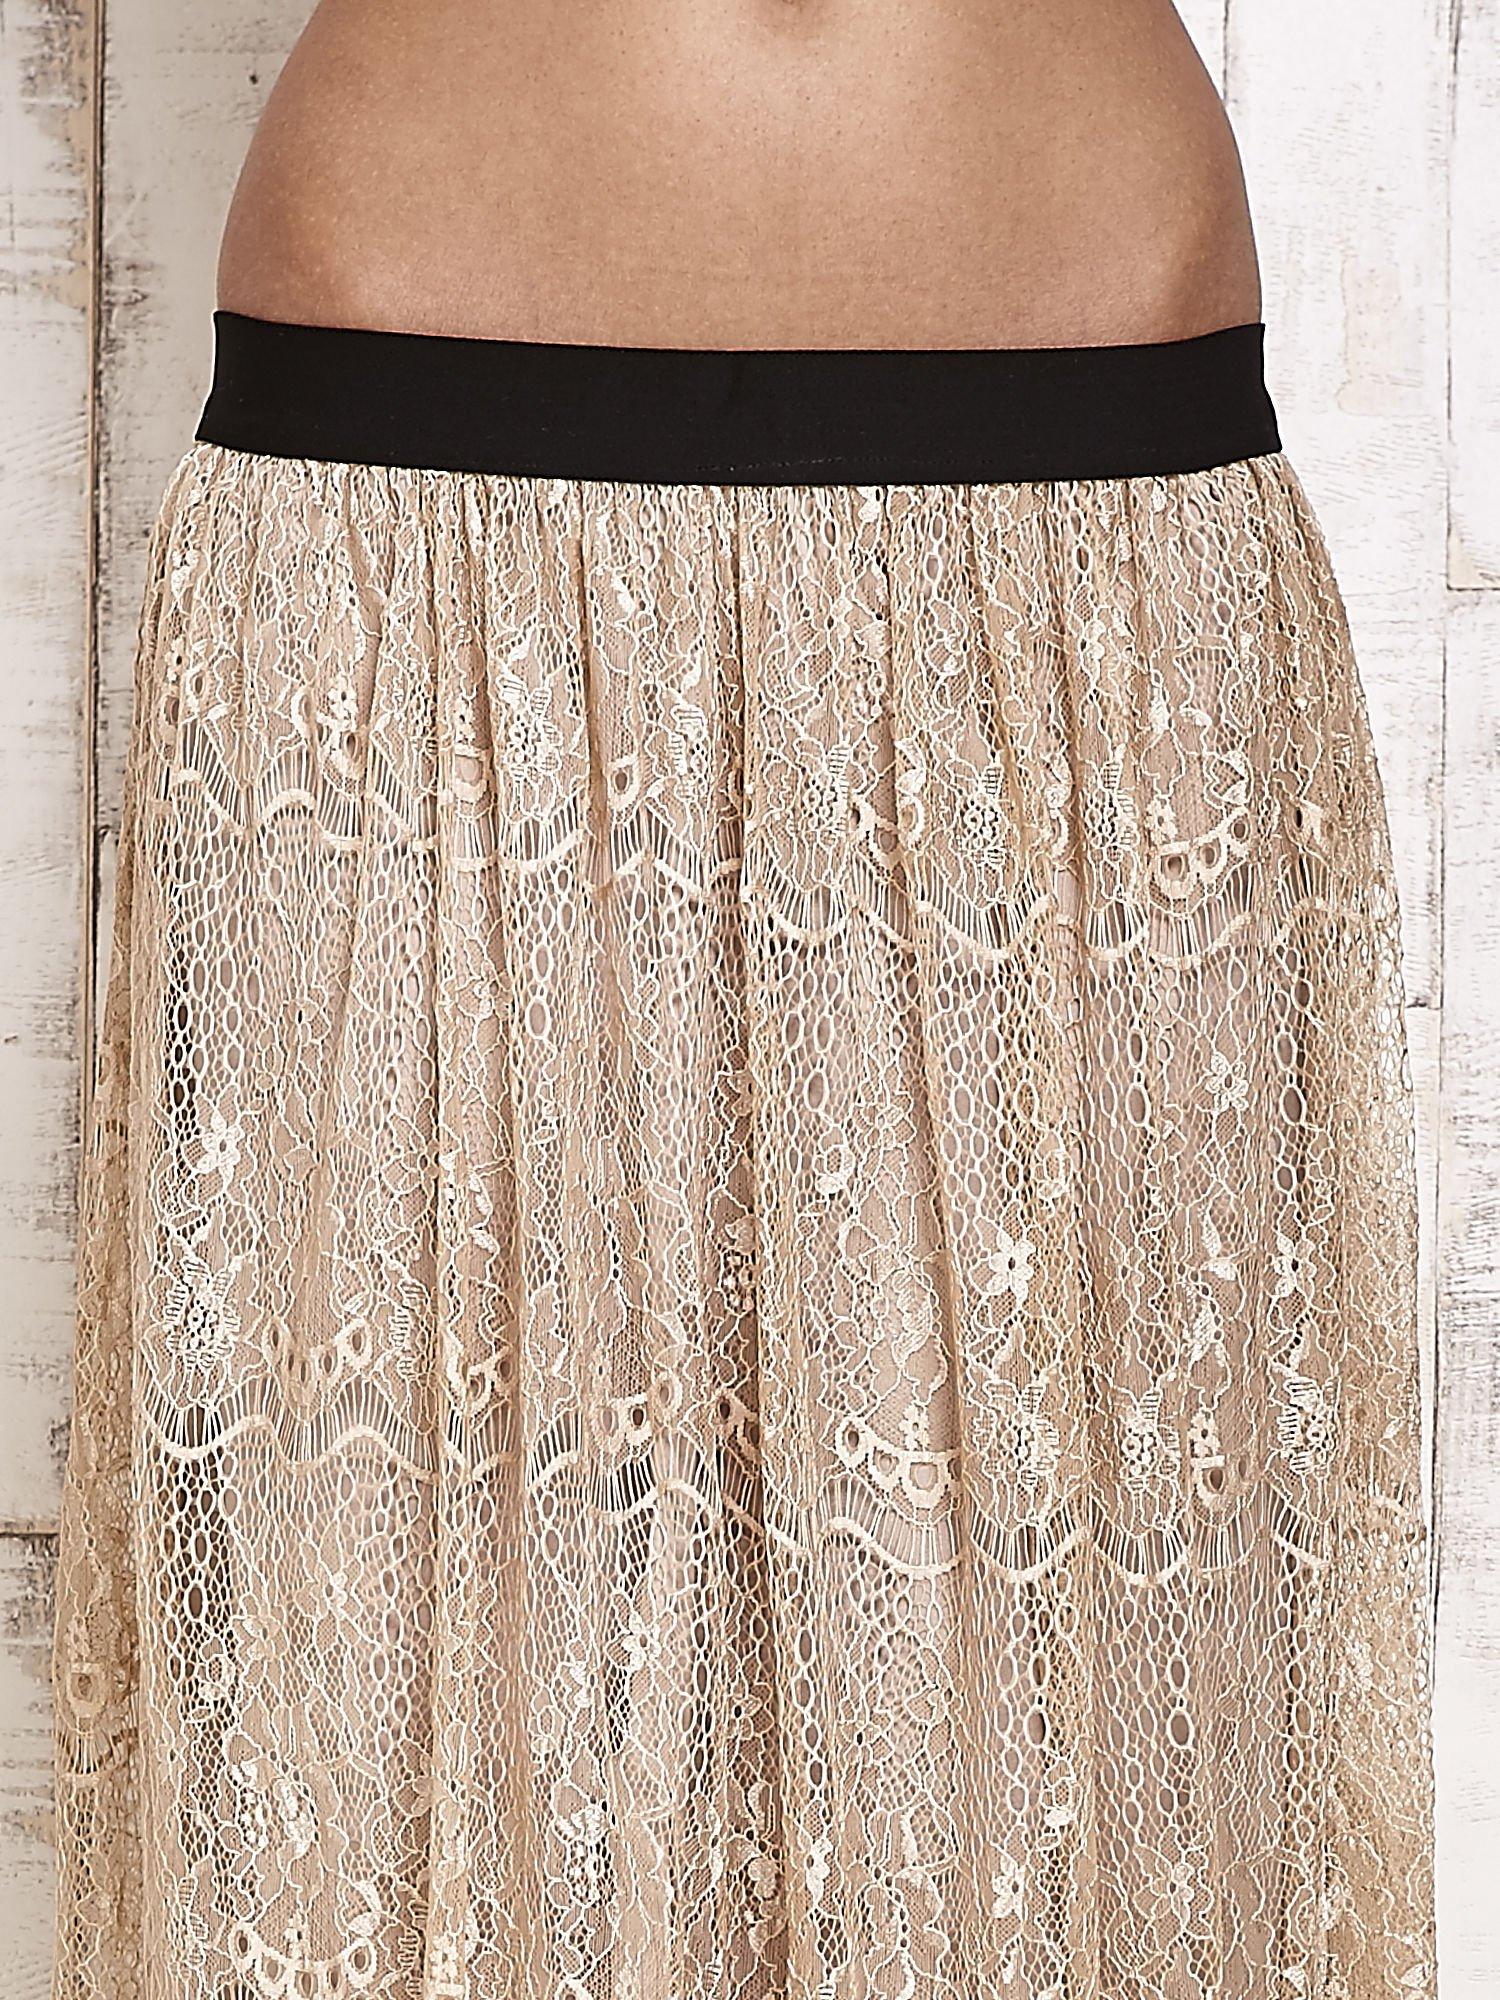 866550520612 Beżowa koronkowa spódnica maxi - Spódnica plisowana - sklep eButik.pl